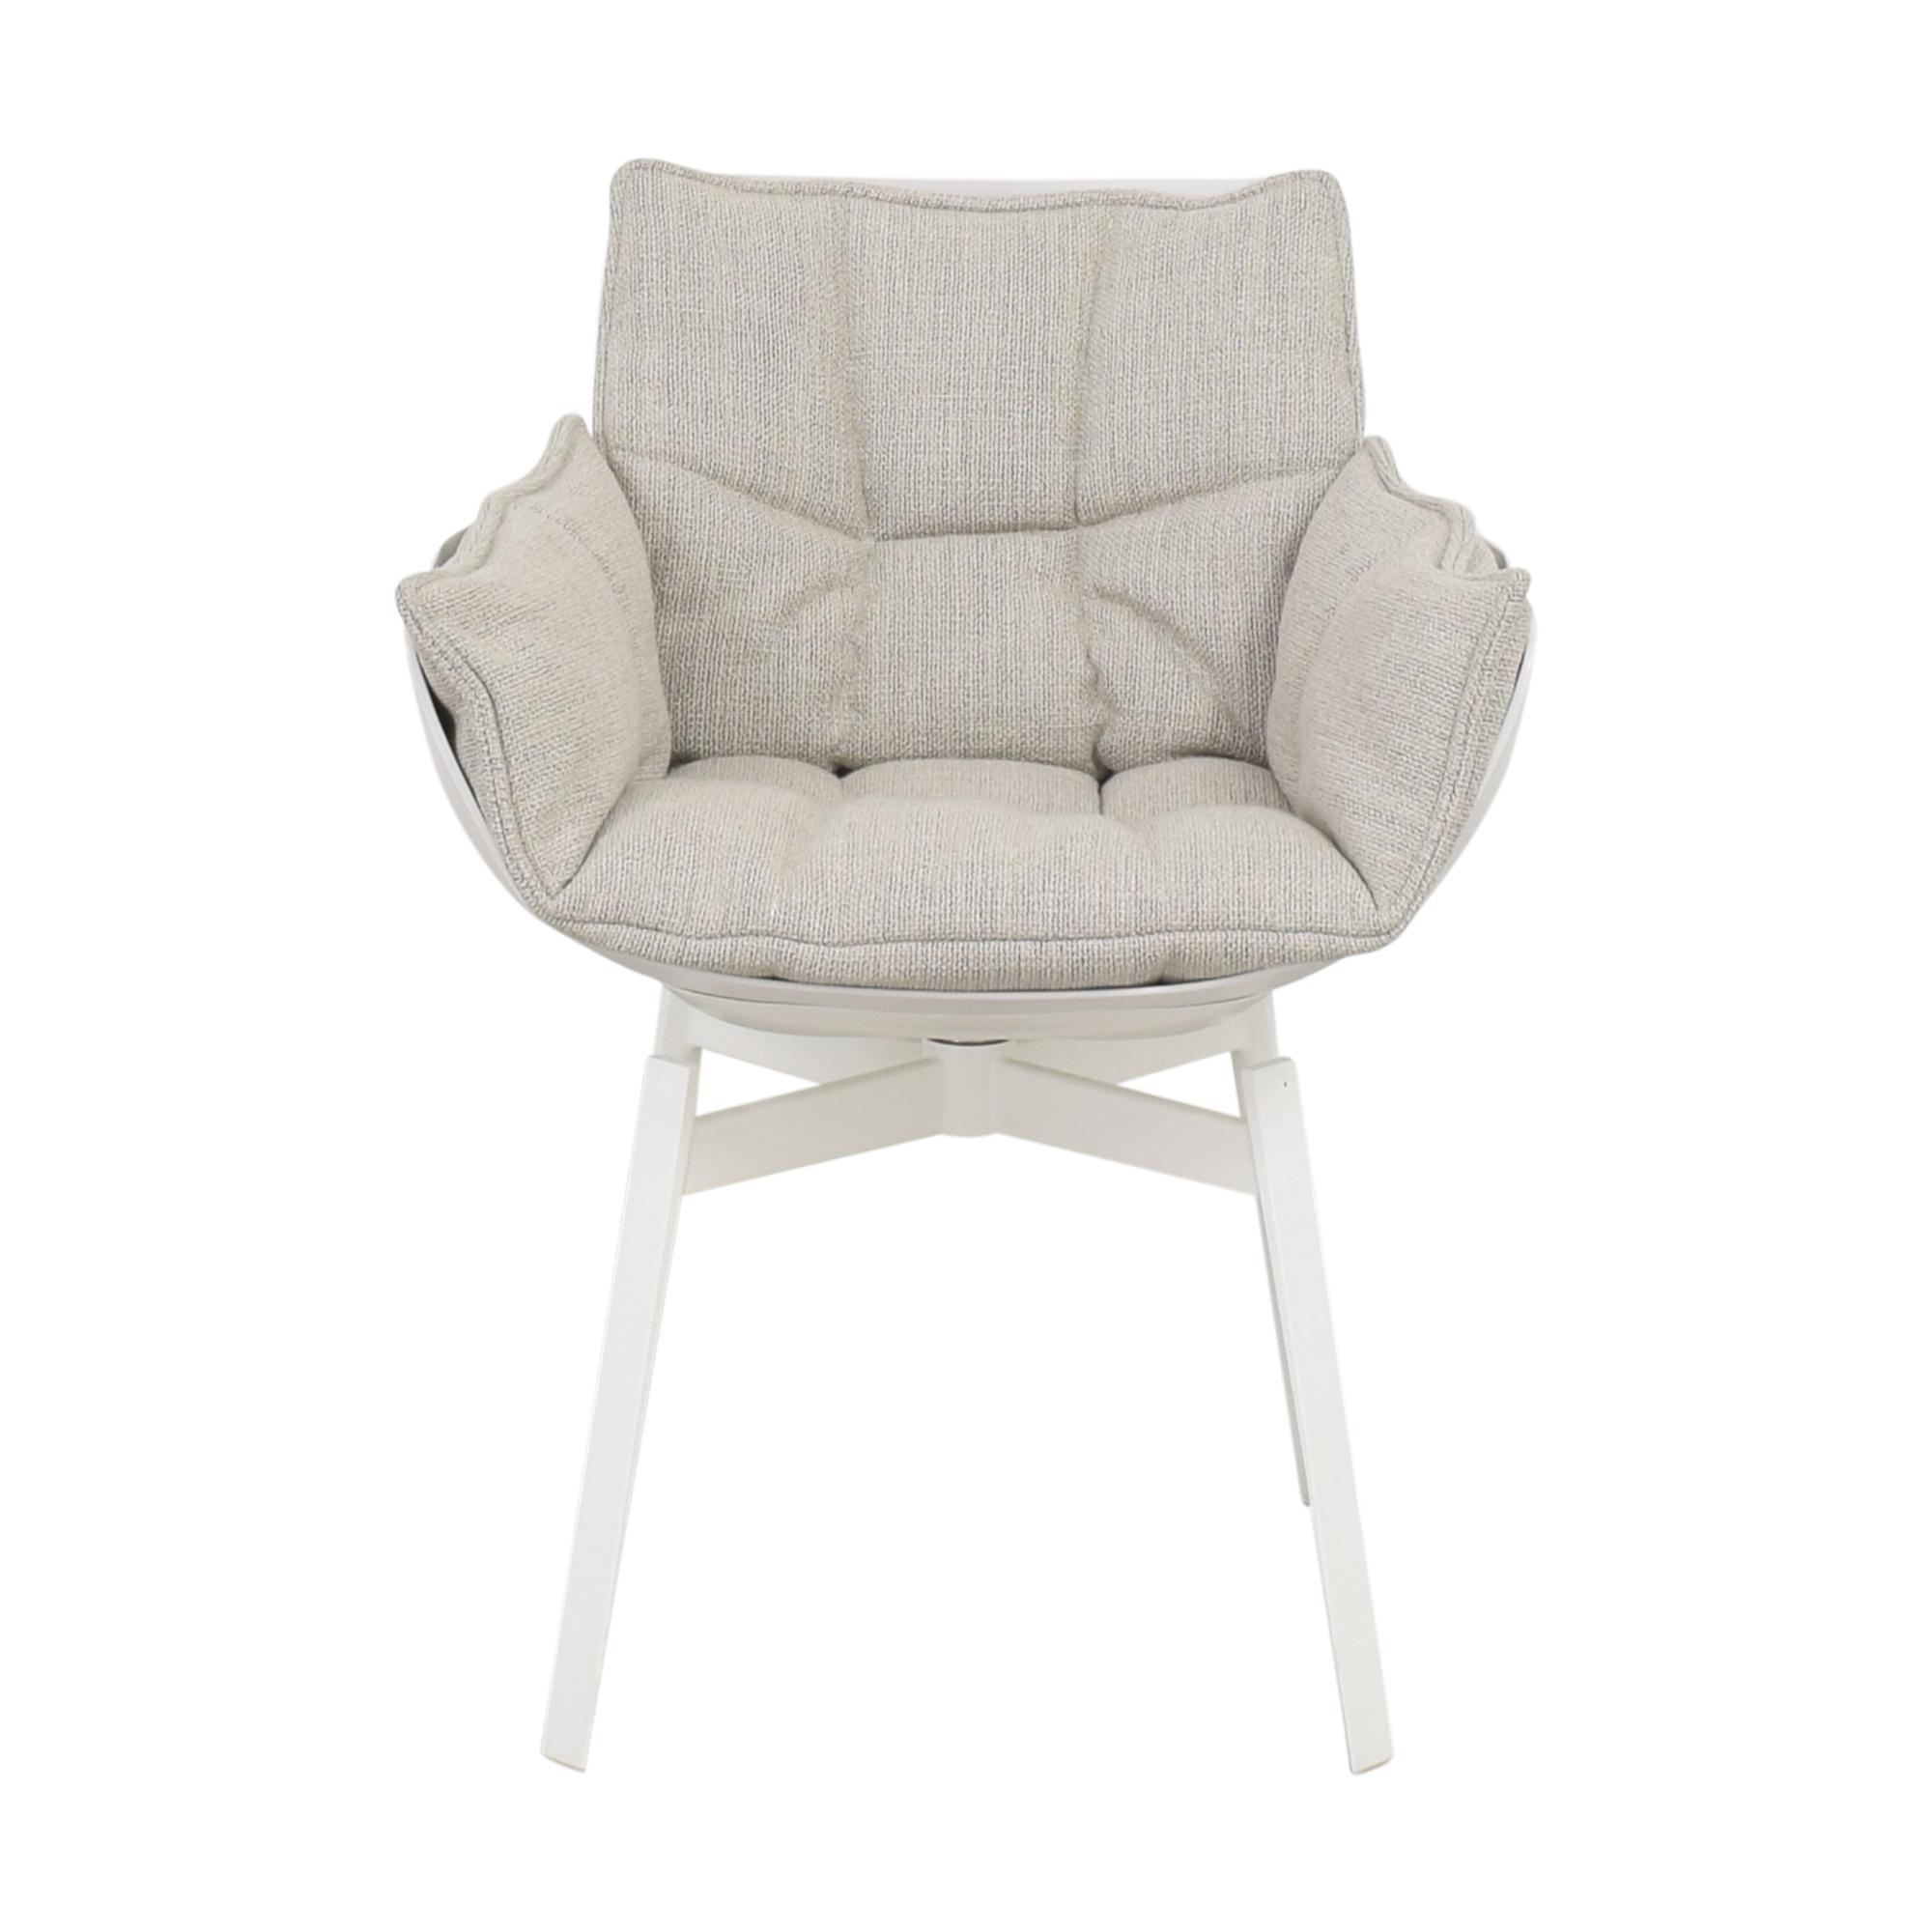 shop B&B Italia Husk Chair B&B Italia Accent Chairs